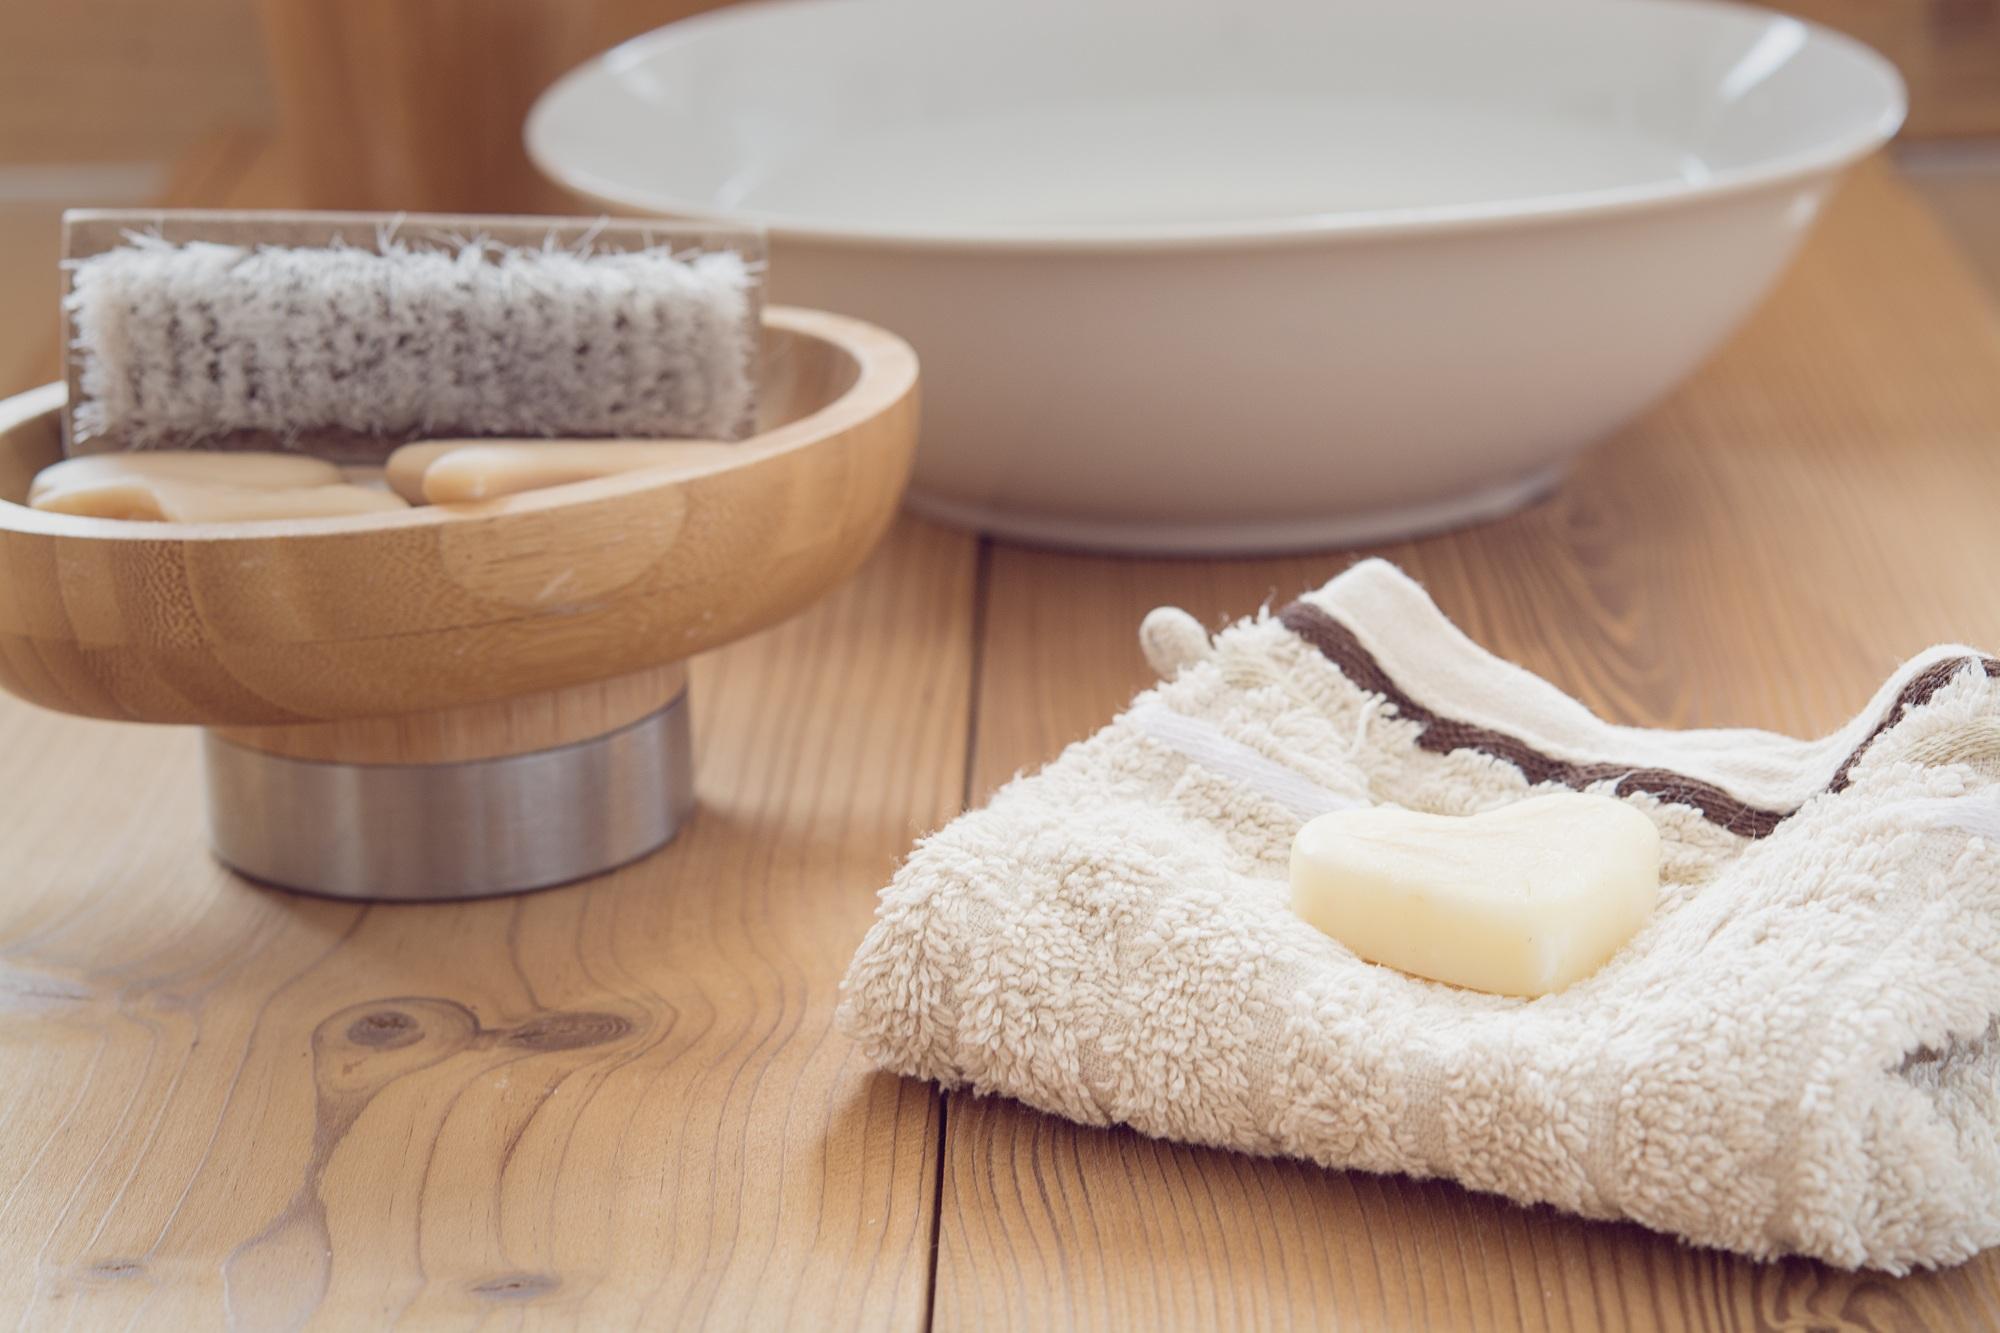 Fotos Gratis Cepillo Cuenco Plato Comida Cer Mico Lavar  # Muebles De Jabon